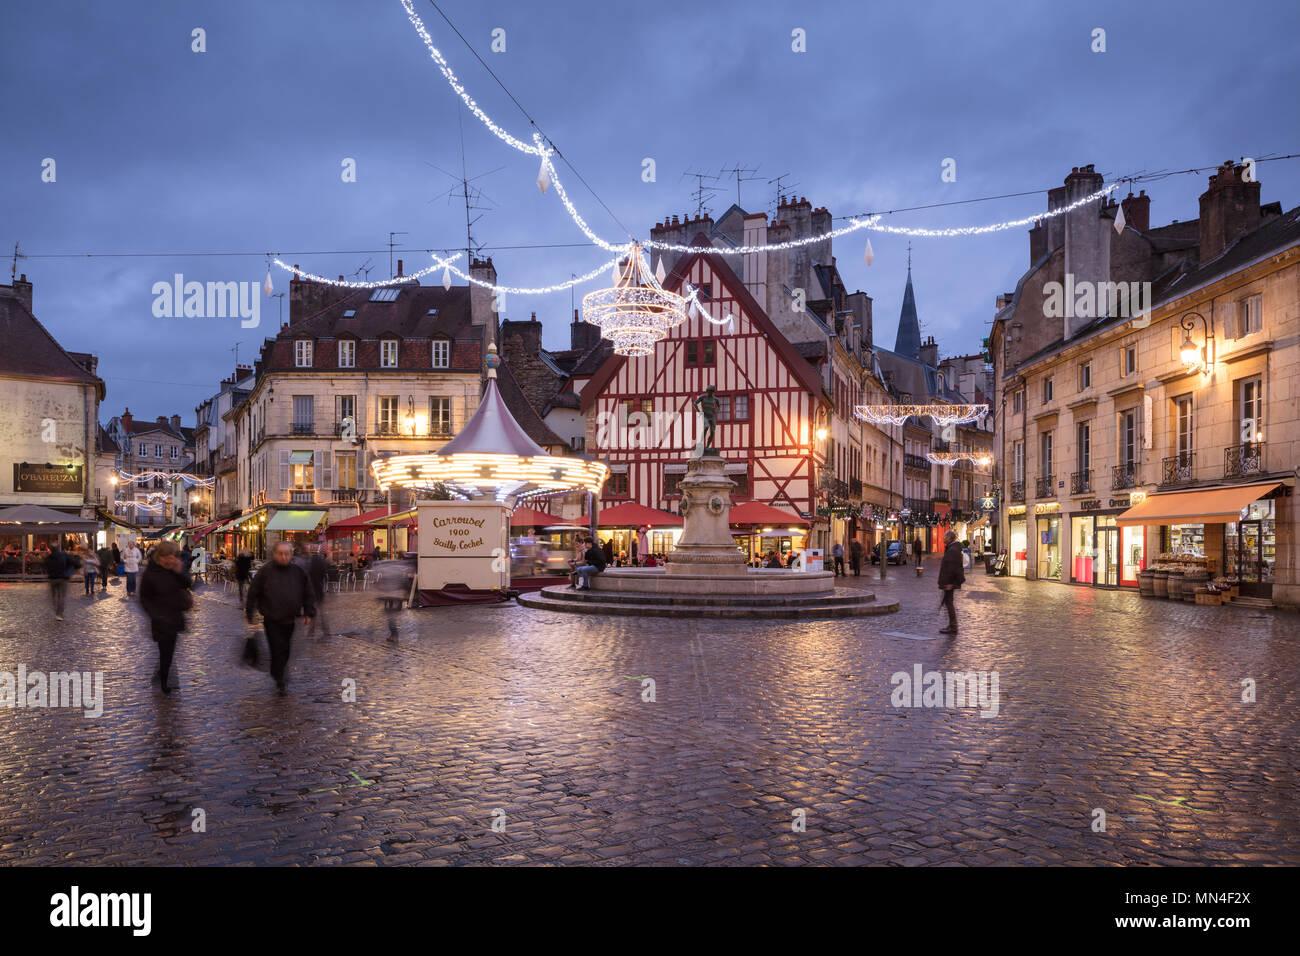 Place Froncois Rude at dusk, Dijon, Bourgogne, France Stock Photo